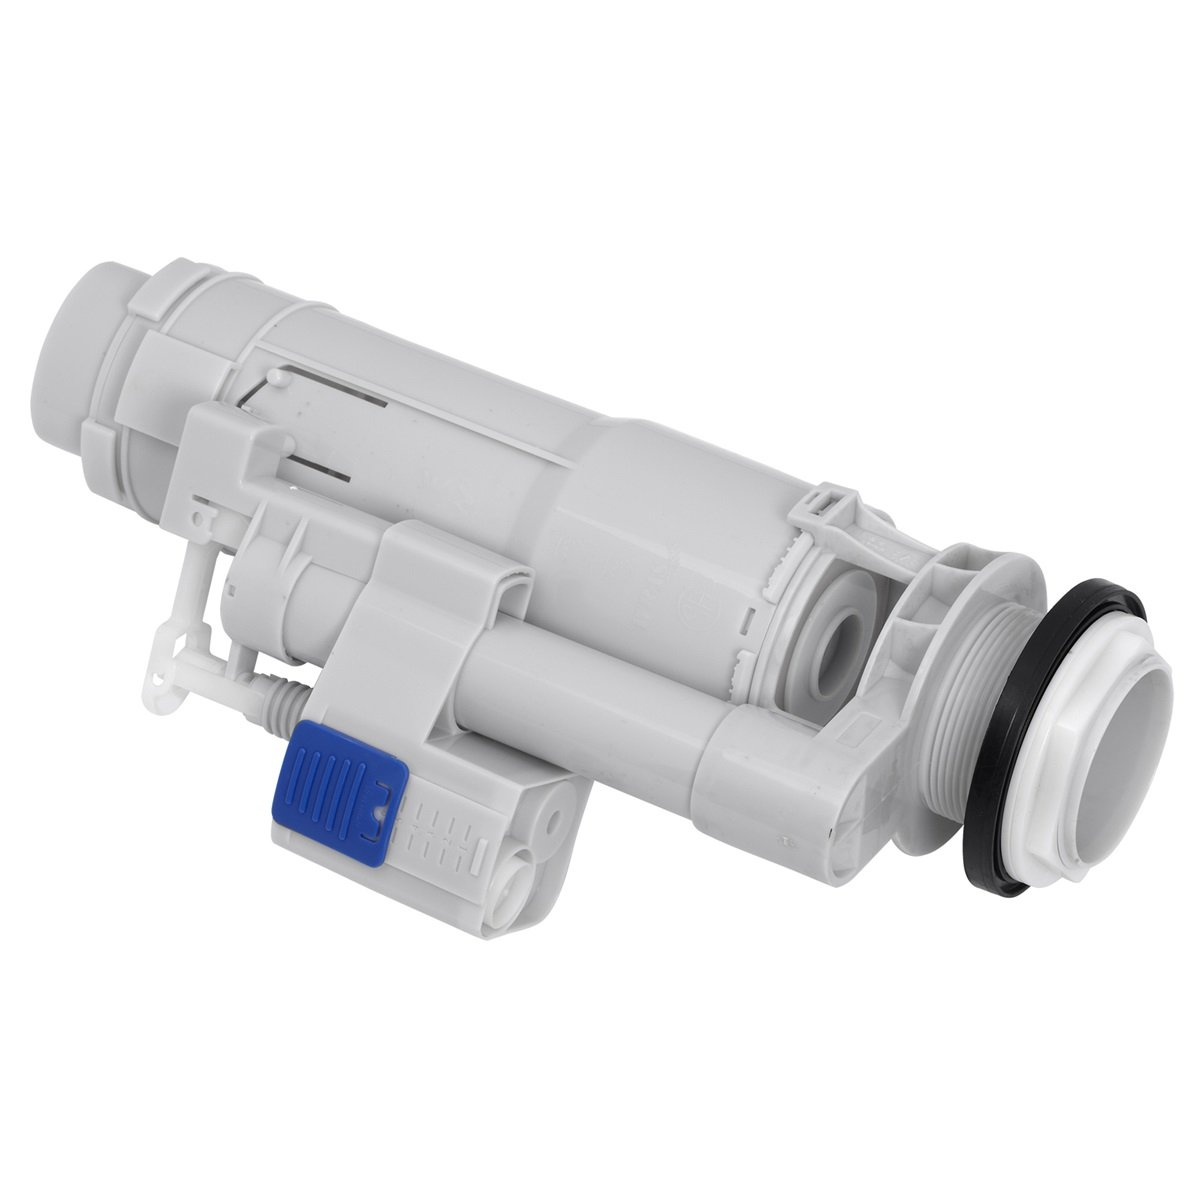 American Standard 7381091-400.0070A Dual Flush Valve, Toilet Repair Part, Plastic, Unfinished